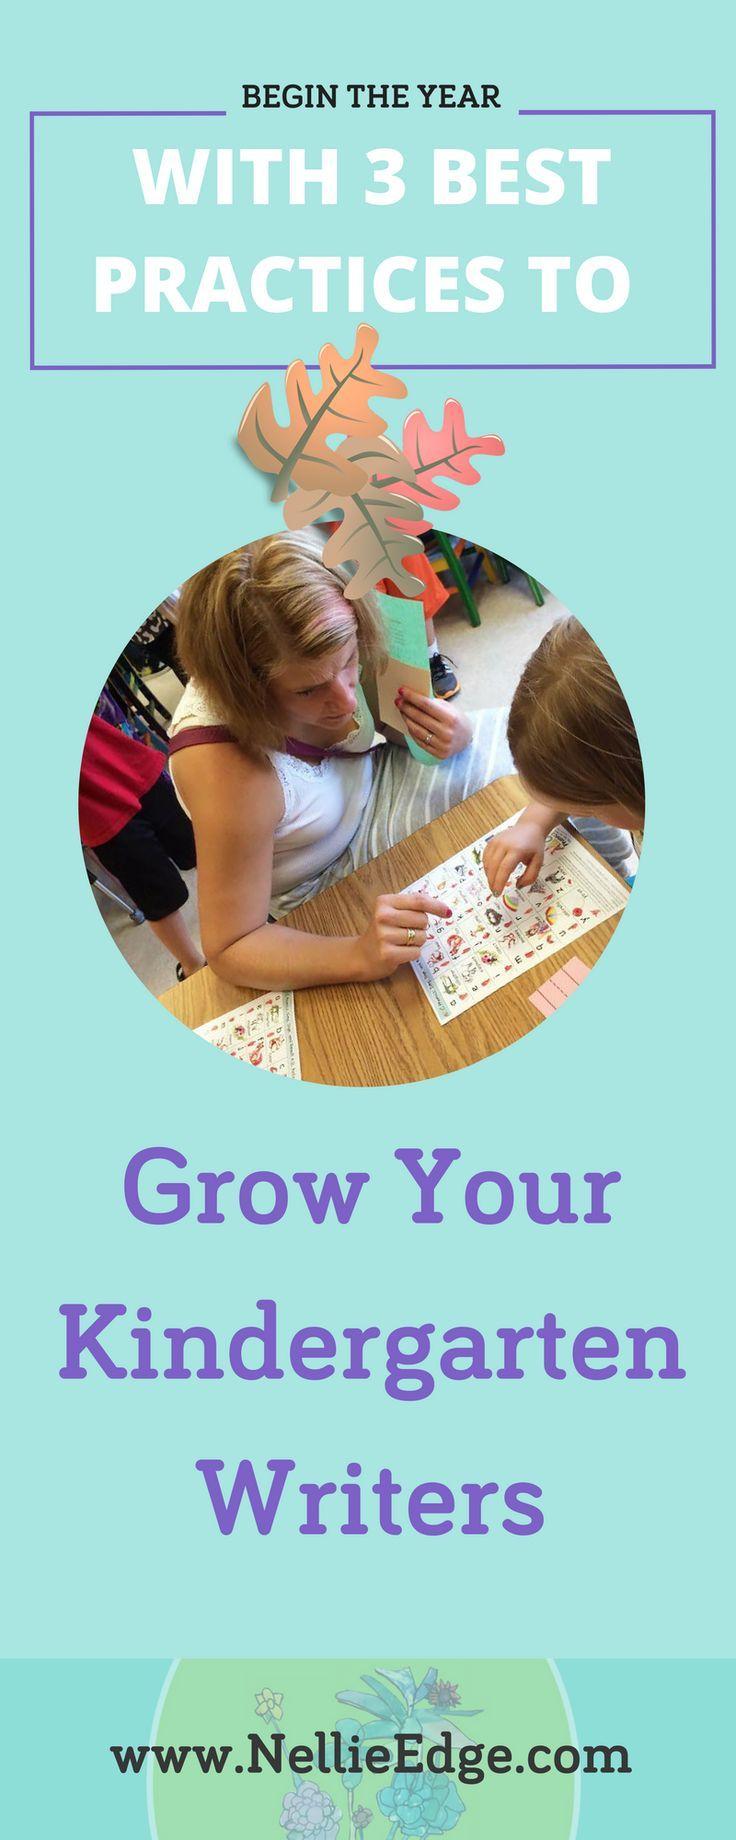 Begin the Year with 3 Best Practices to Grow Your Kindergarten